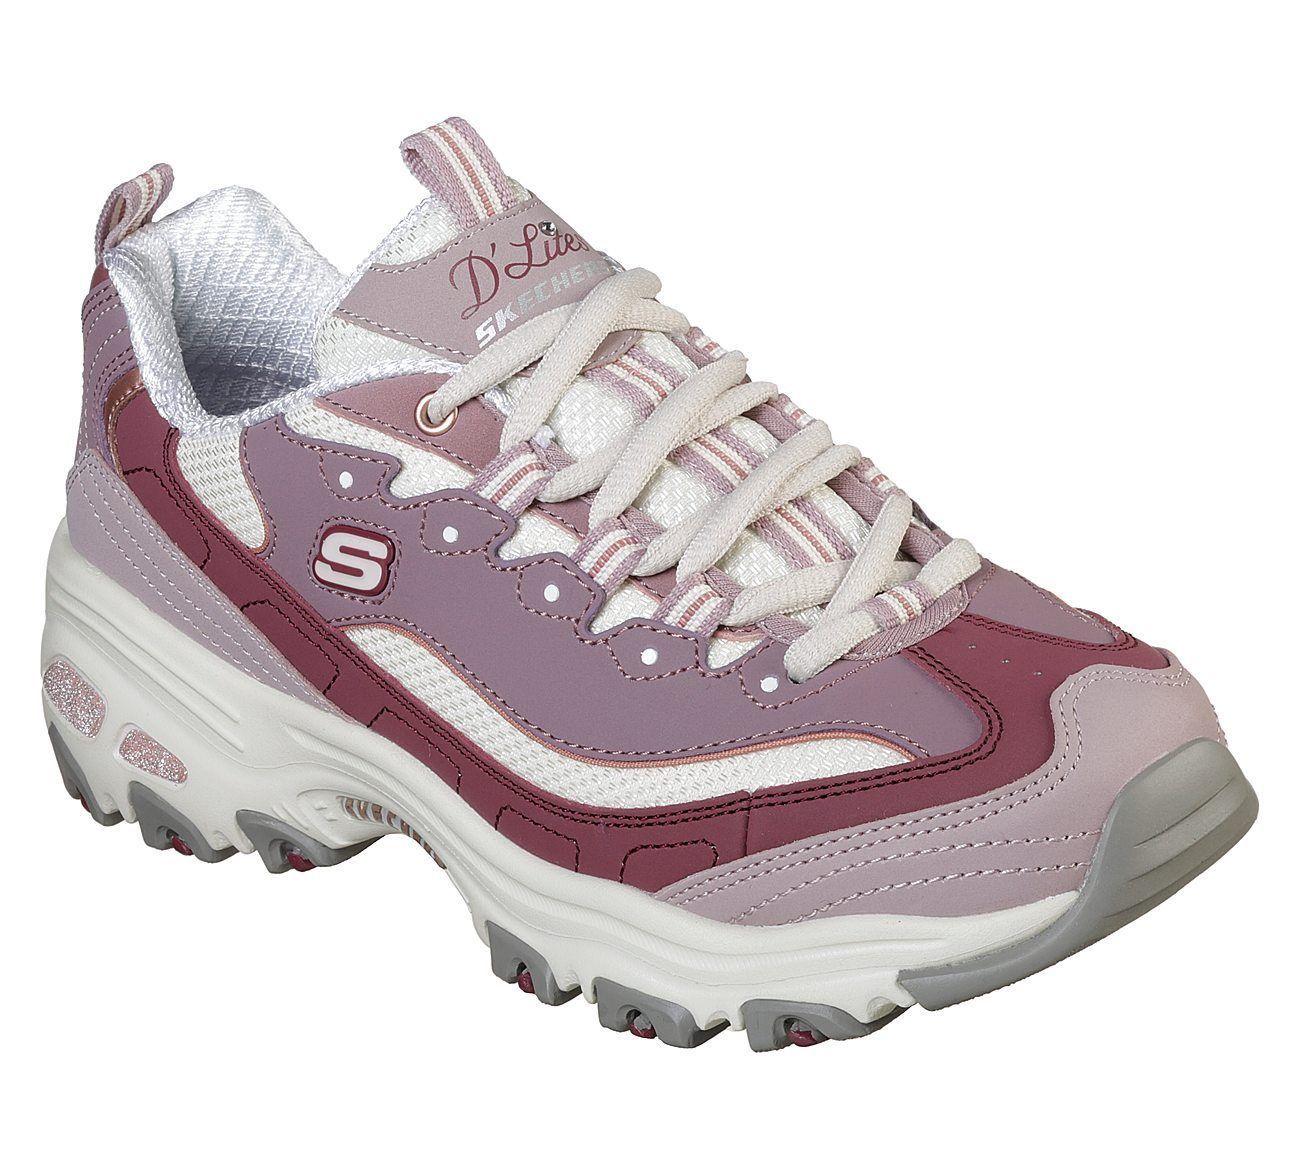 13143 Viola Dlites Skechers Scarpe Donna Sport Memory Foam Sneaker in pelle